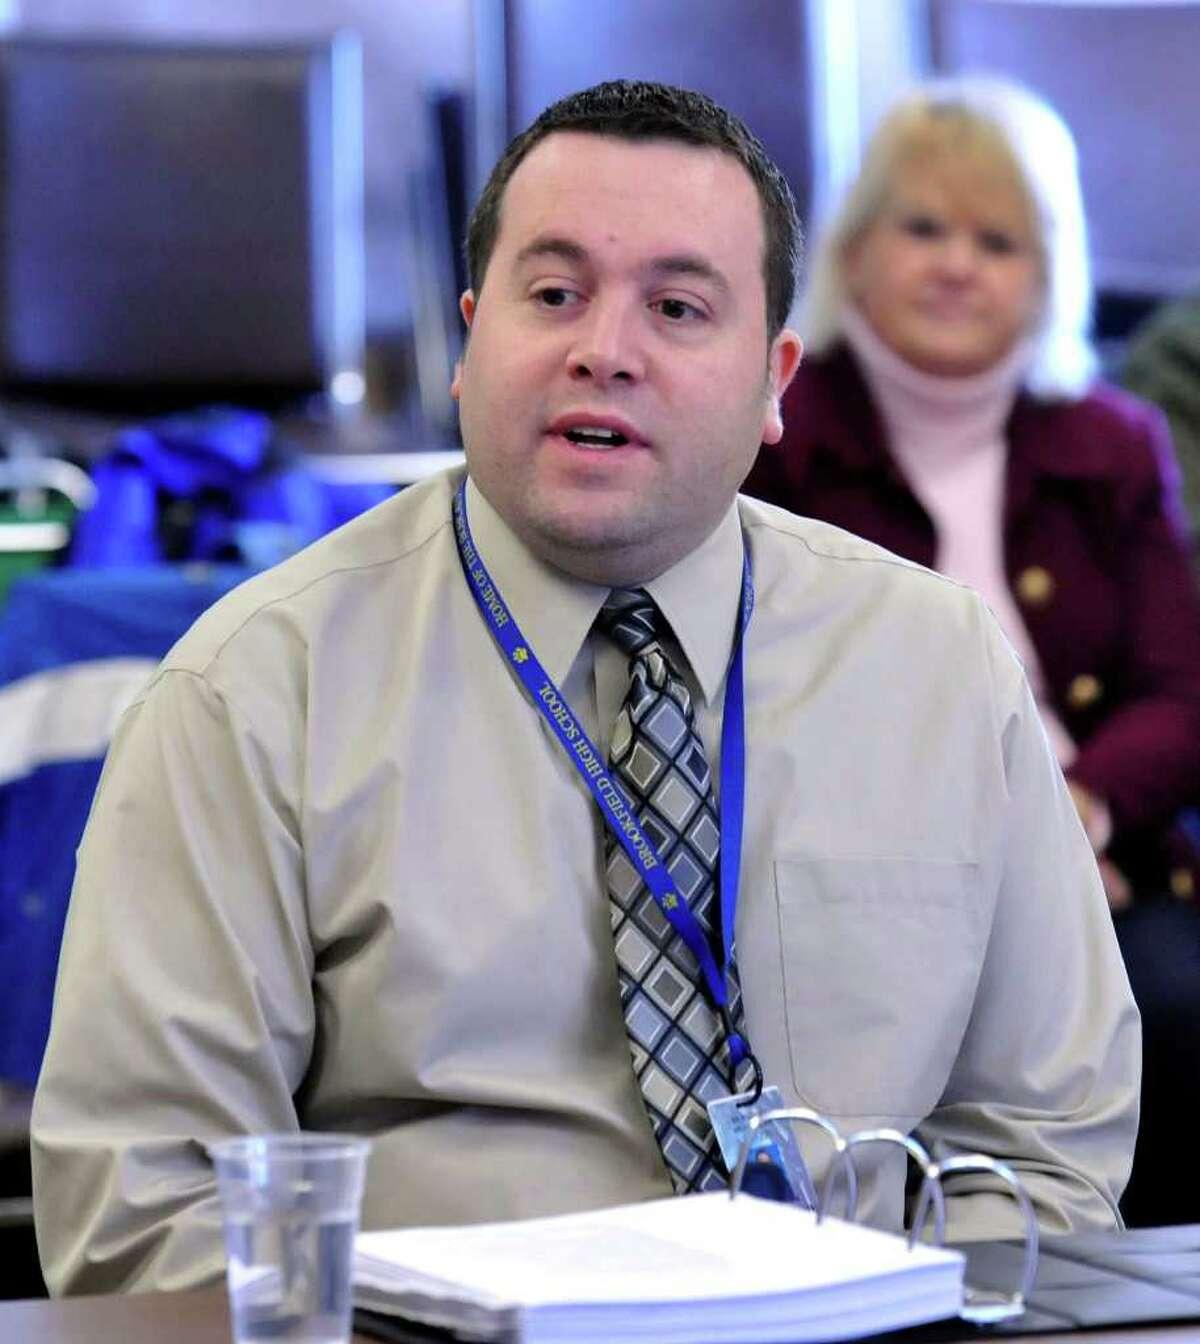 Ed Bednarik, math deptartment chairman for Brookfield Public Schools, testifies during the termination hearing of high school math teacher Robert Wollkind, Thursday, March 3, 2011.